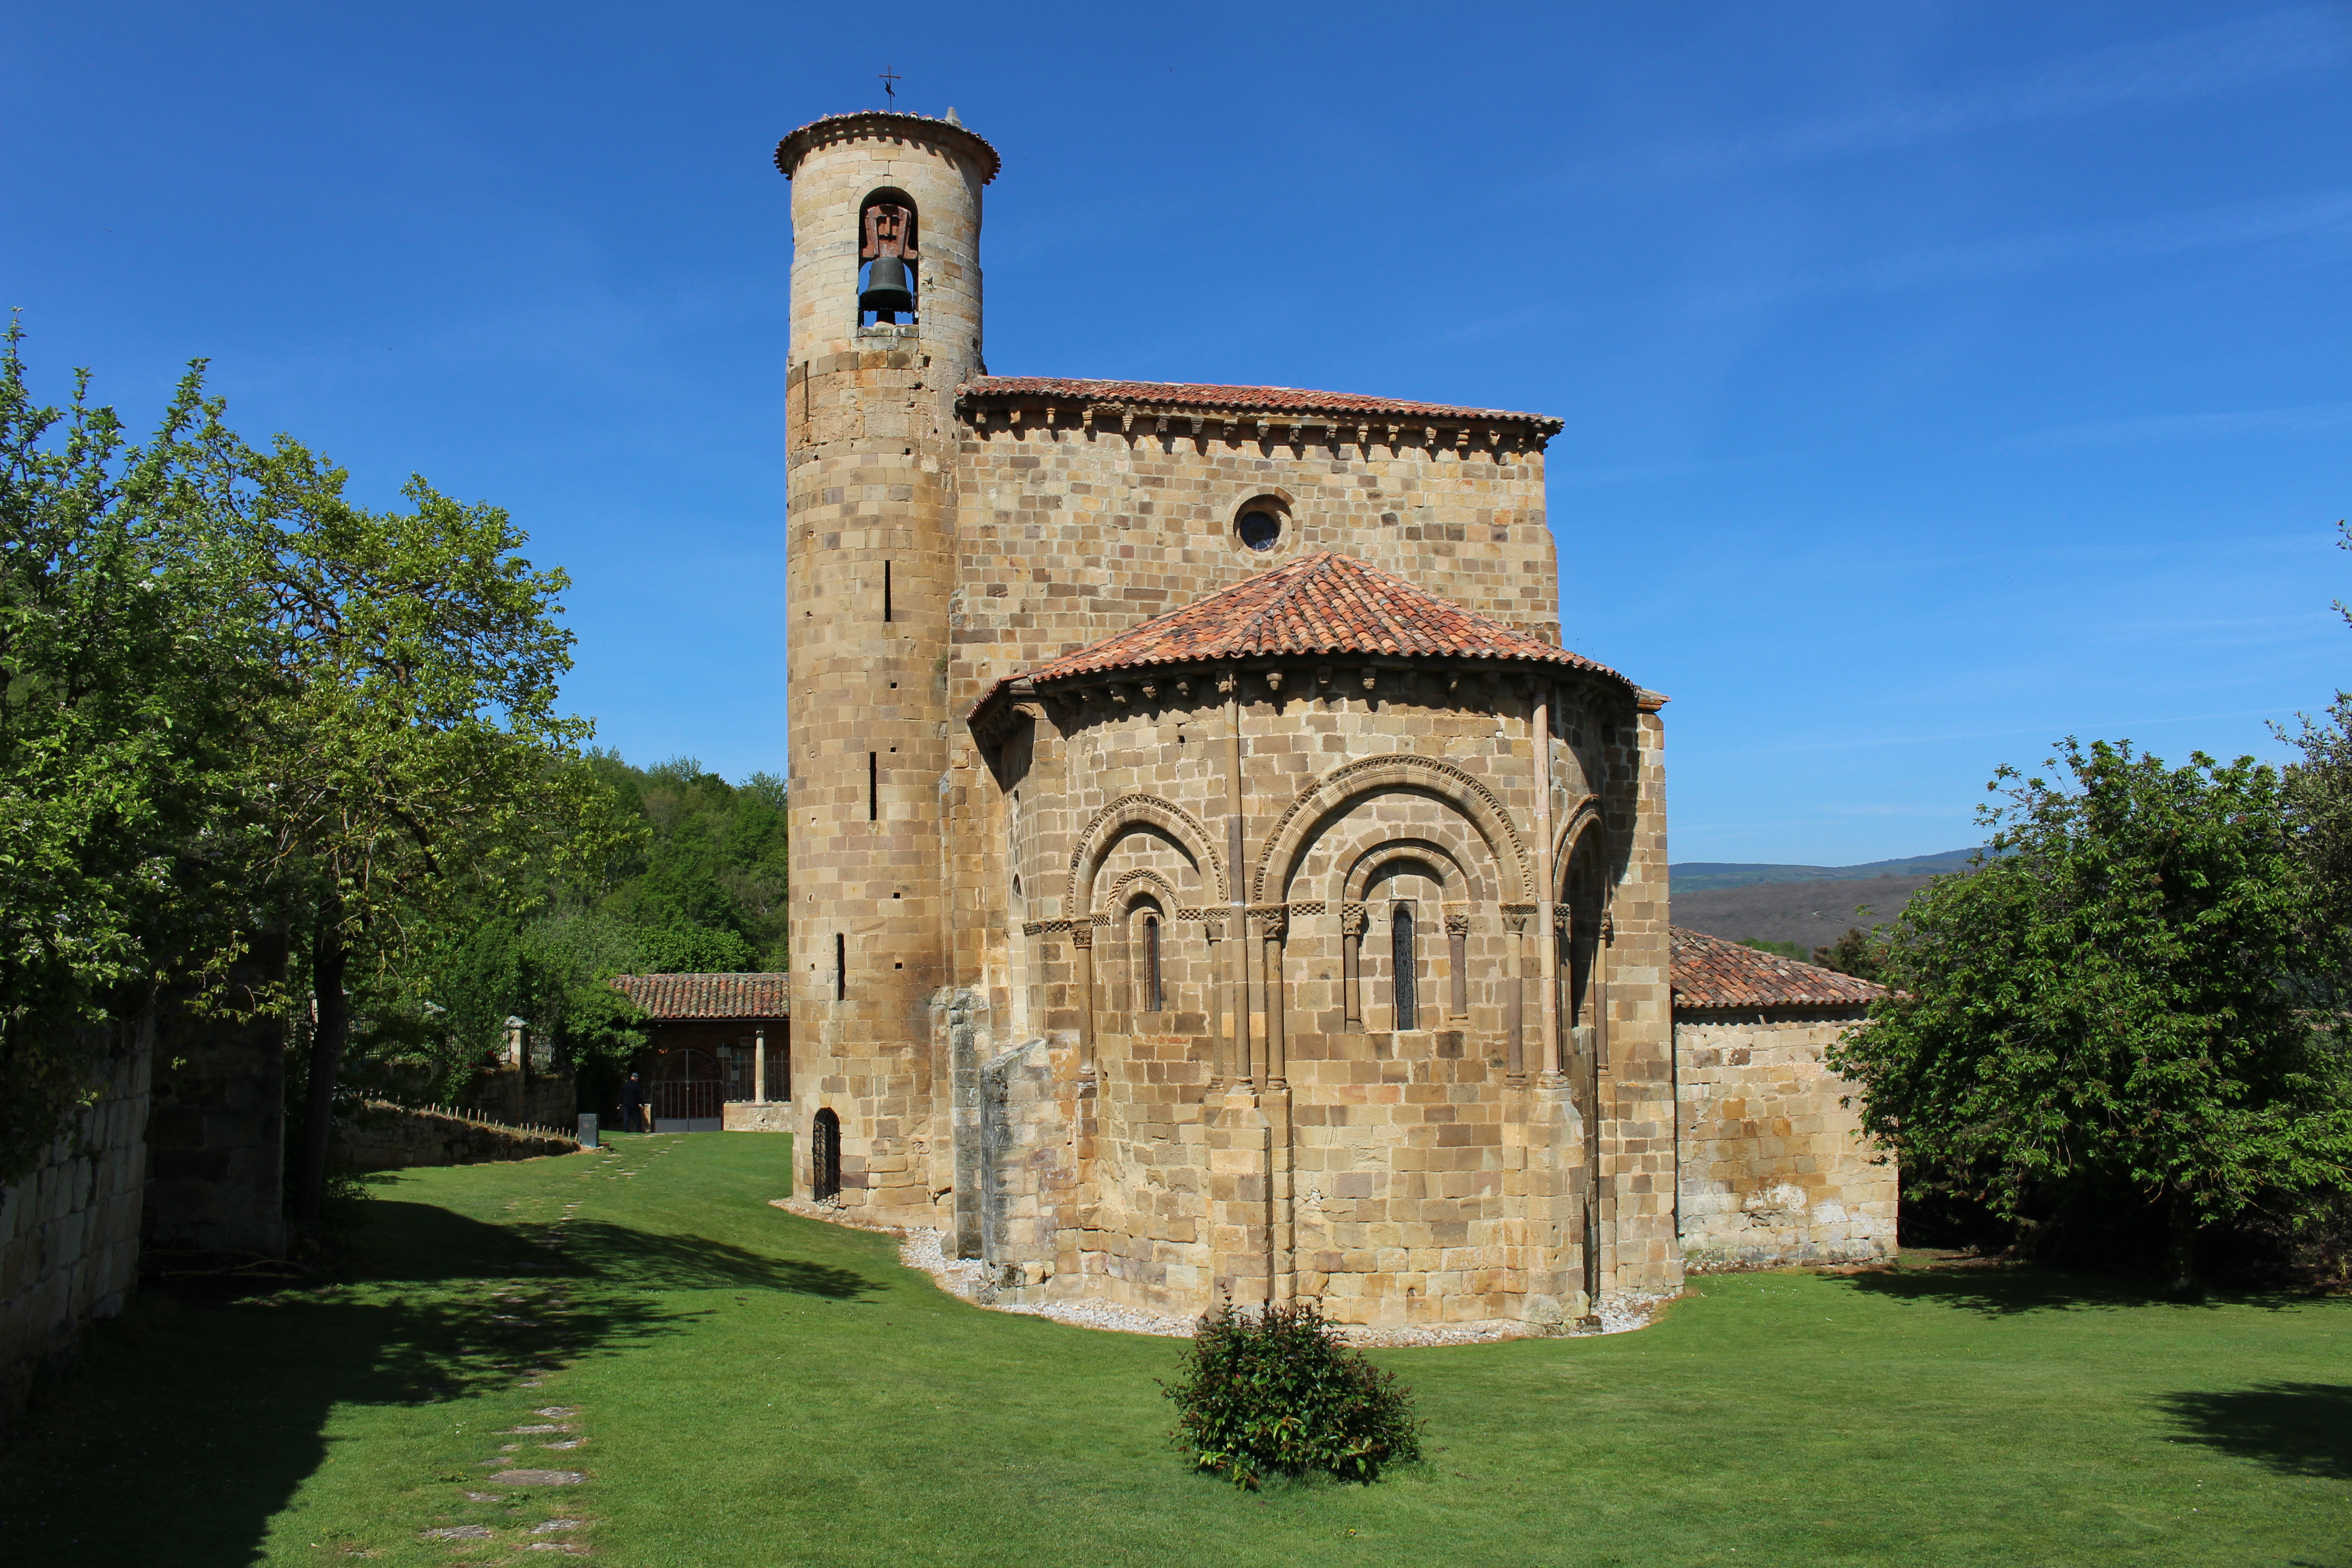 Orbaneja Del Castillo Mapa.Route Pesquera De Ebro Orbaneja Del Castillo San Martin De